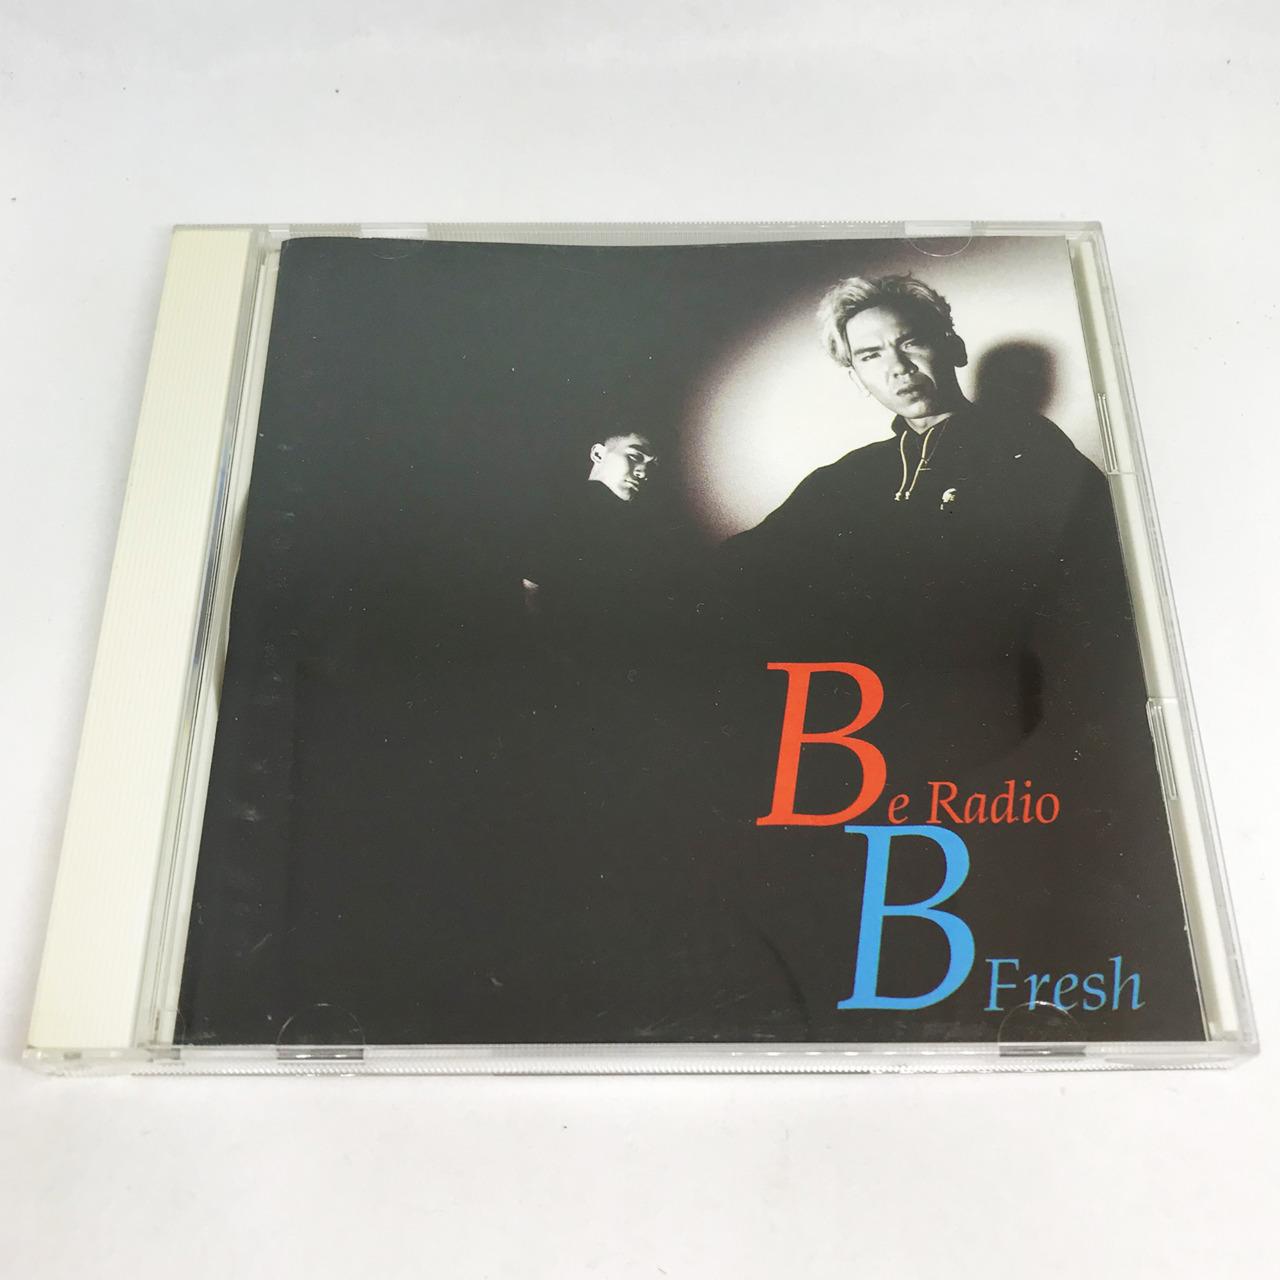 B-FRESH / BE RADIO